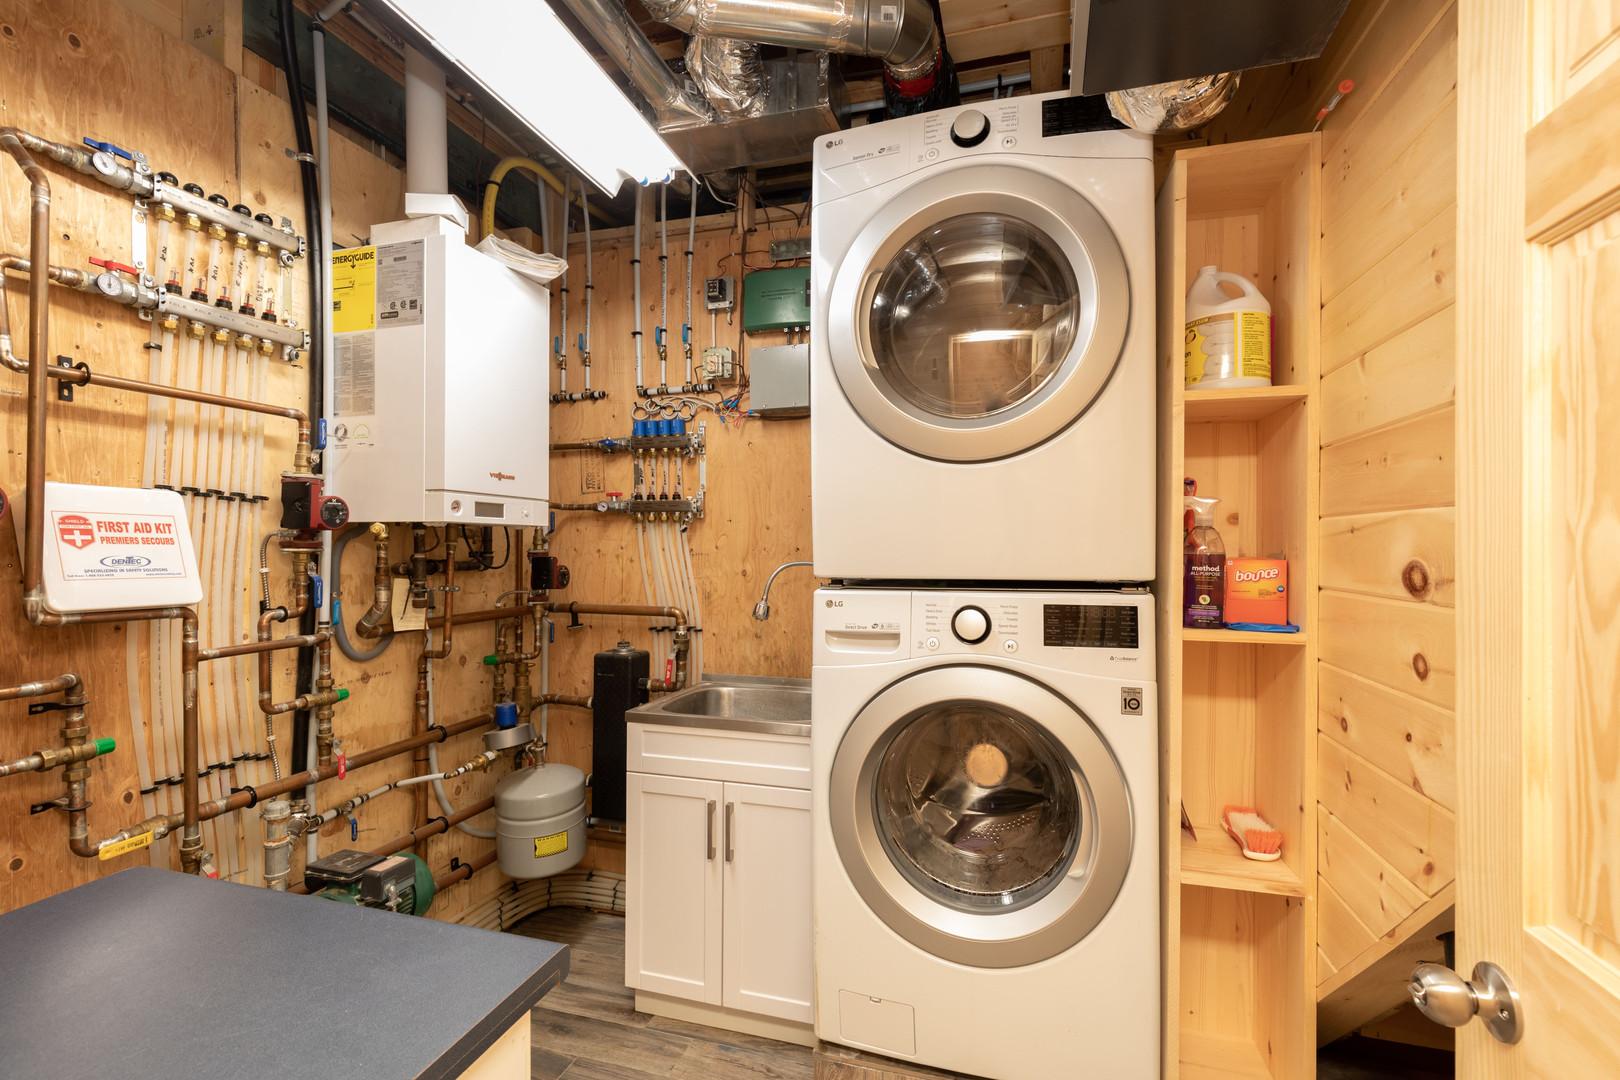 Cottage rental laundry